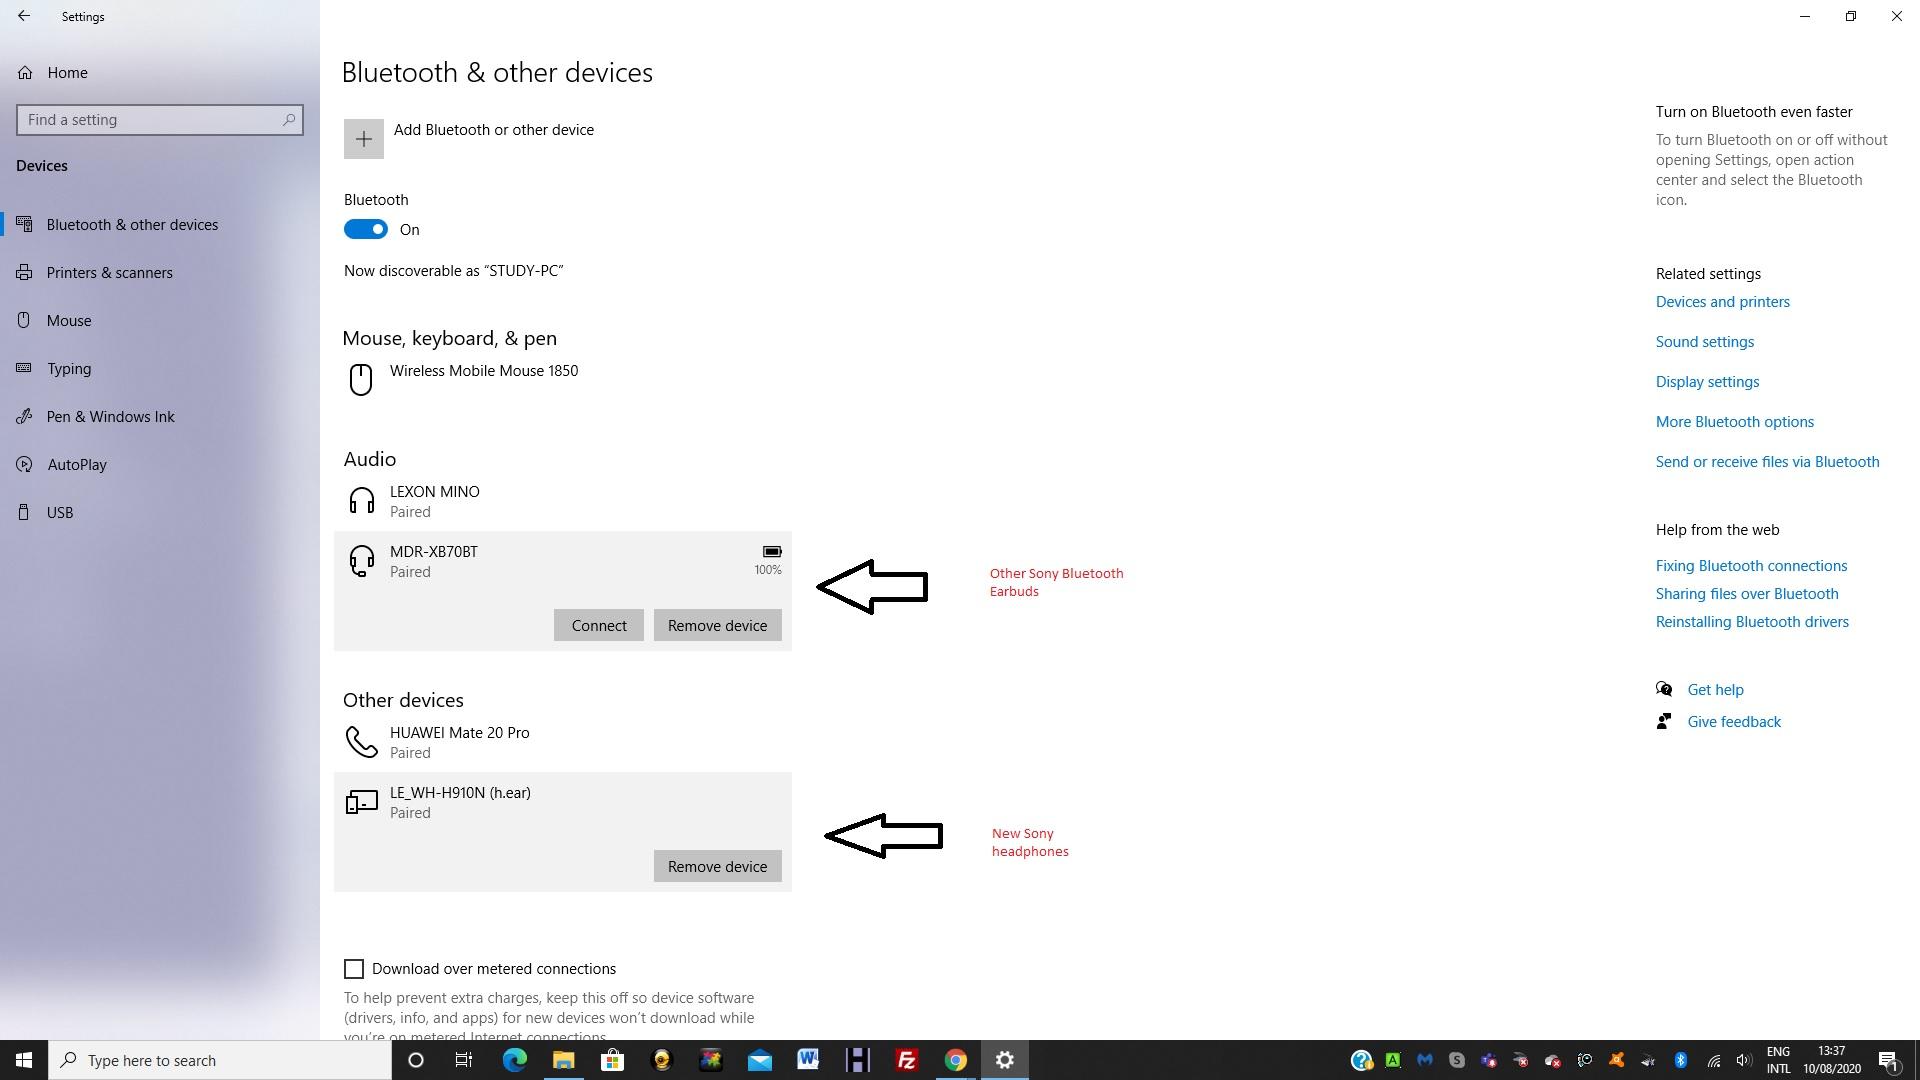 Sony WH-XB900N Headphone pairing but not recognised as an audio device 9ef758e5-0c05-4deb-a47b-e16d34ba9ade?upload=true.jpg